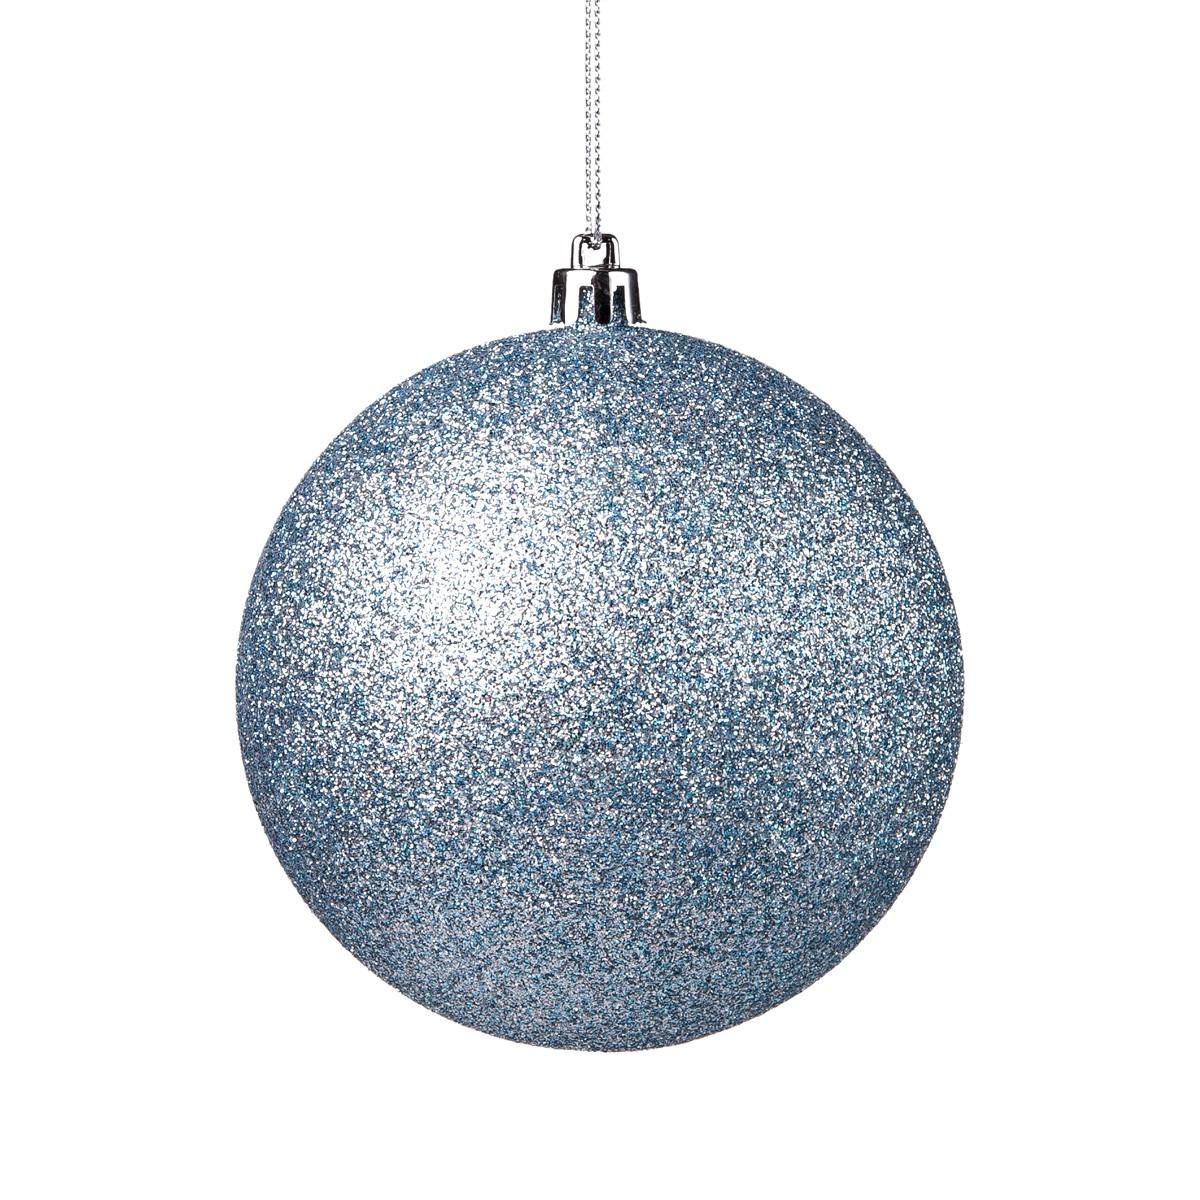 Sfera Glitter Azzurra Diam. 10